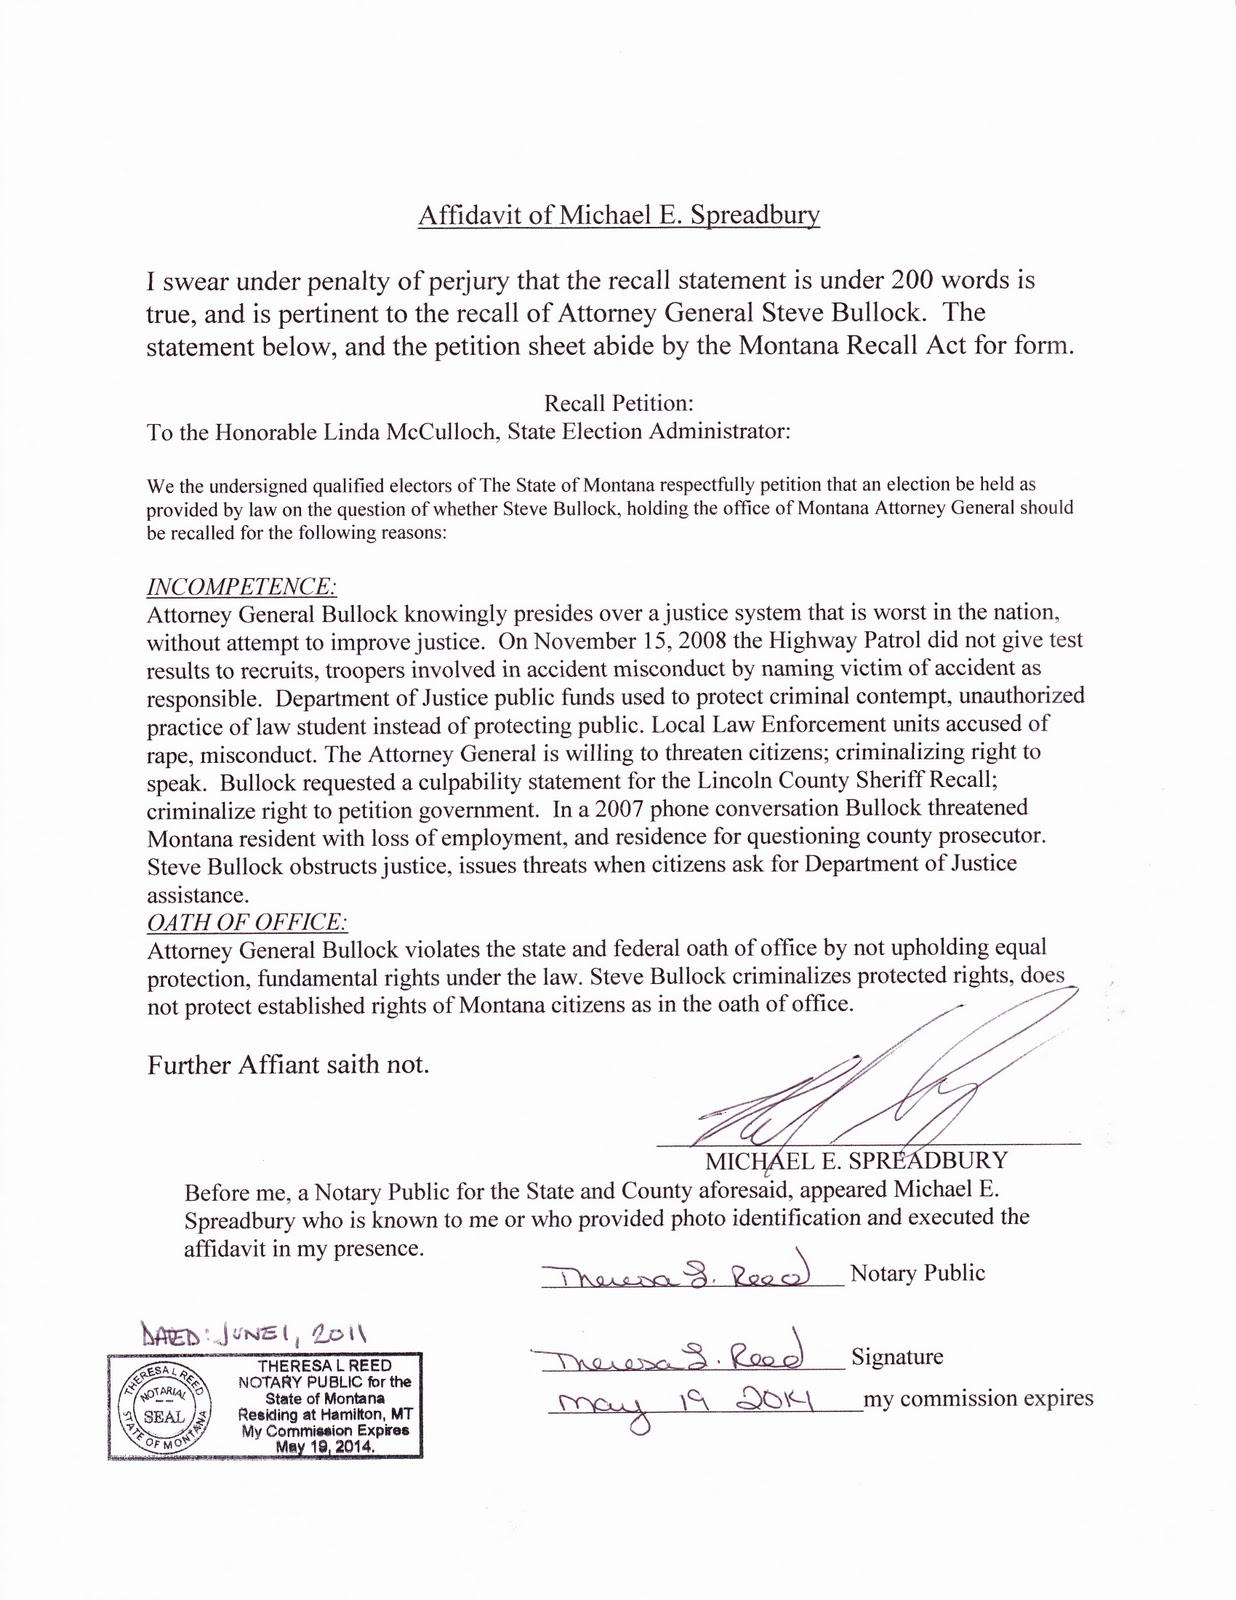 Affidavit Template marriage free printable documents general – Affidavit of Truth Template